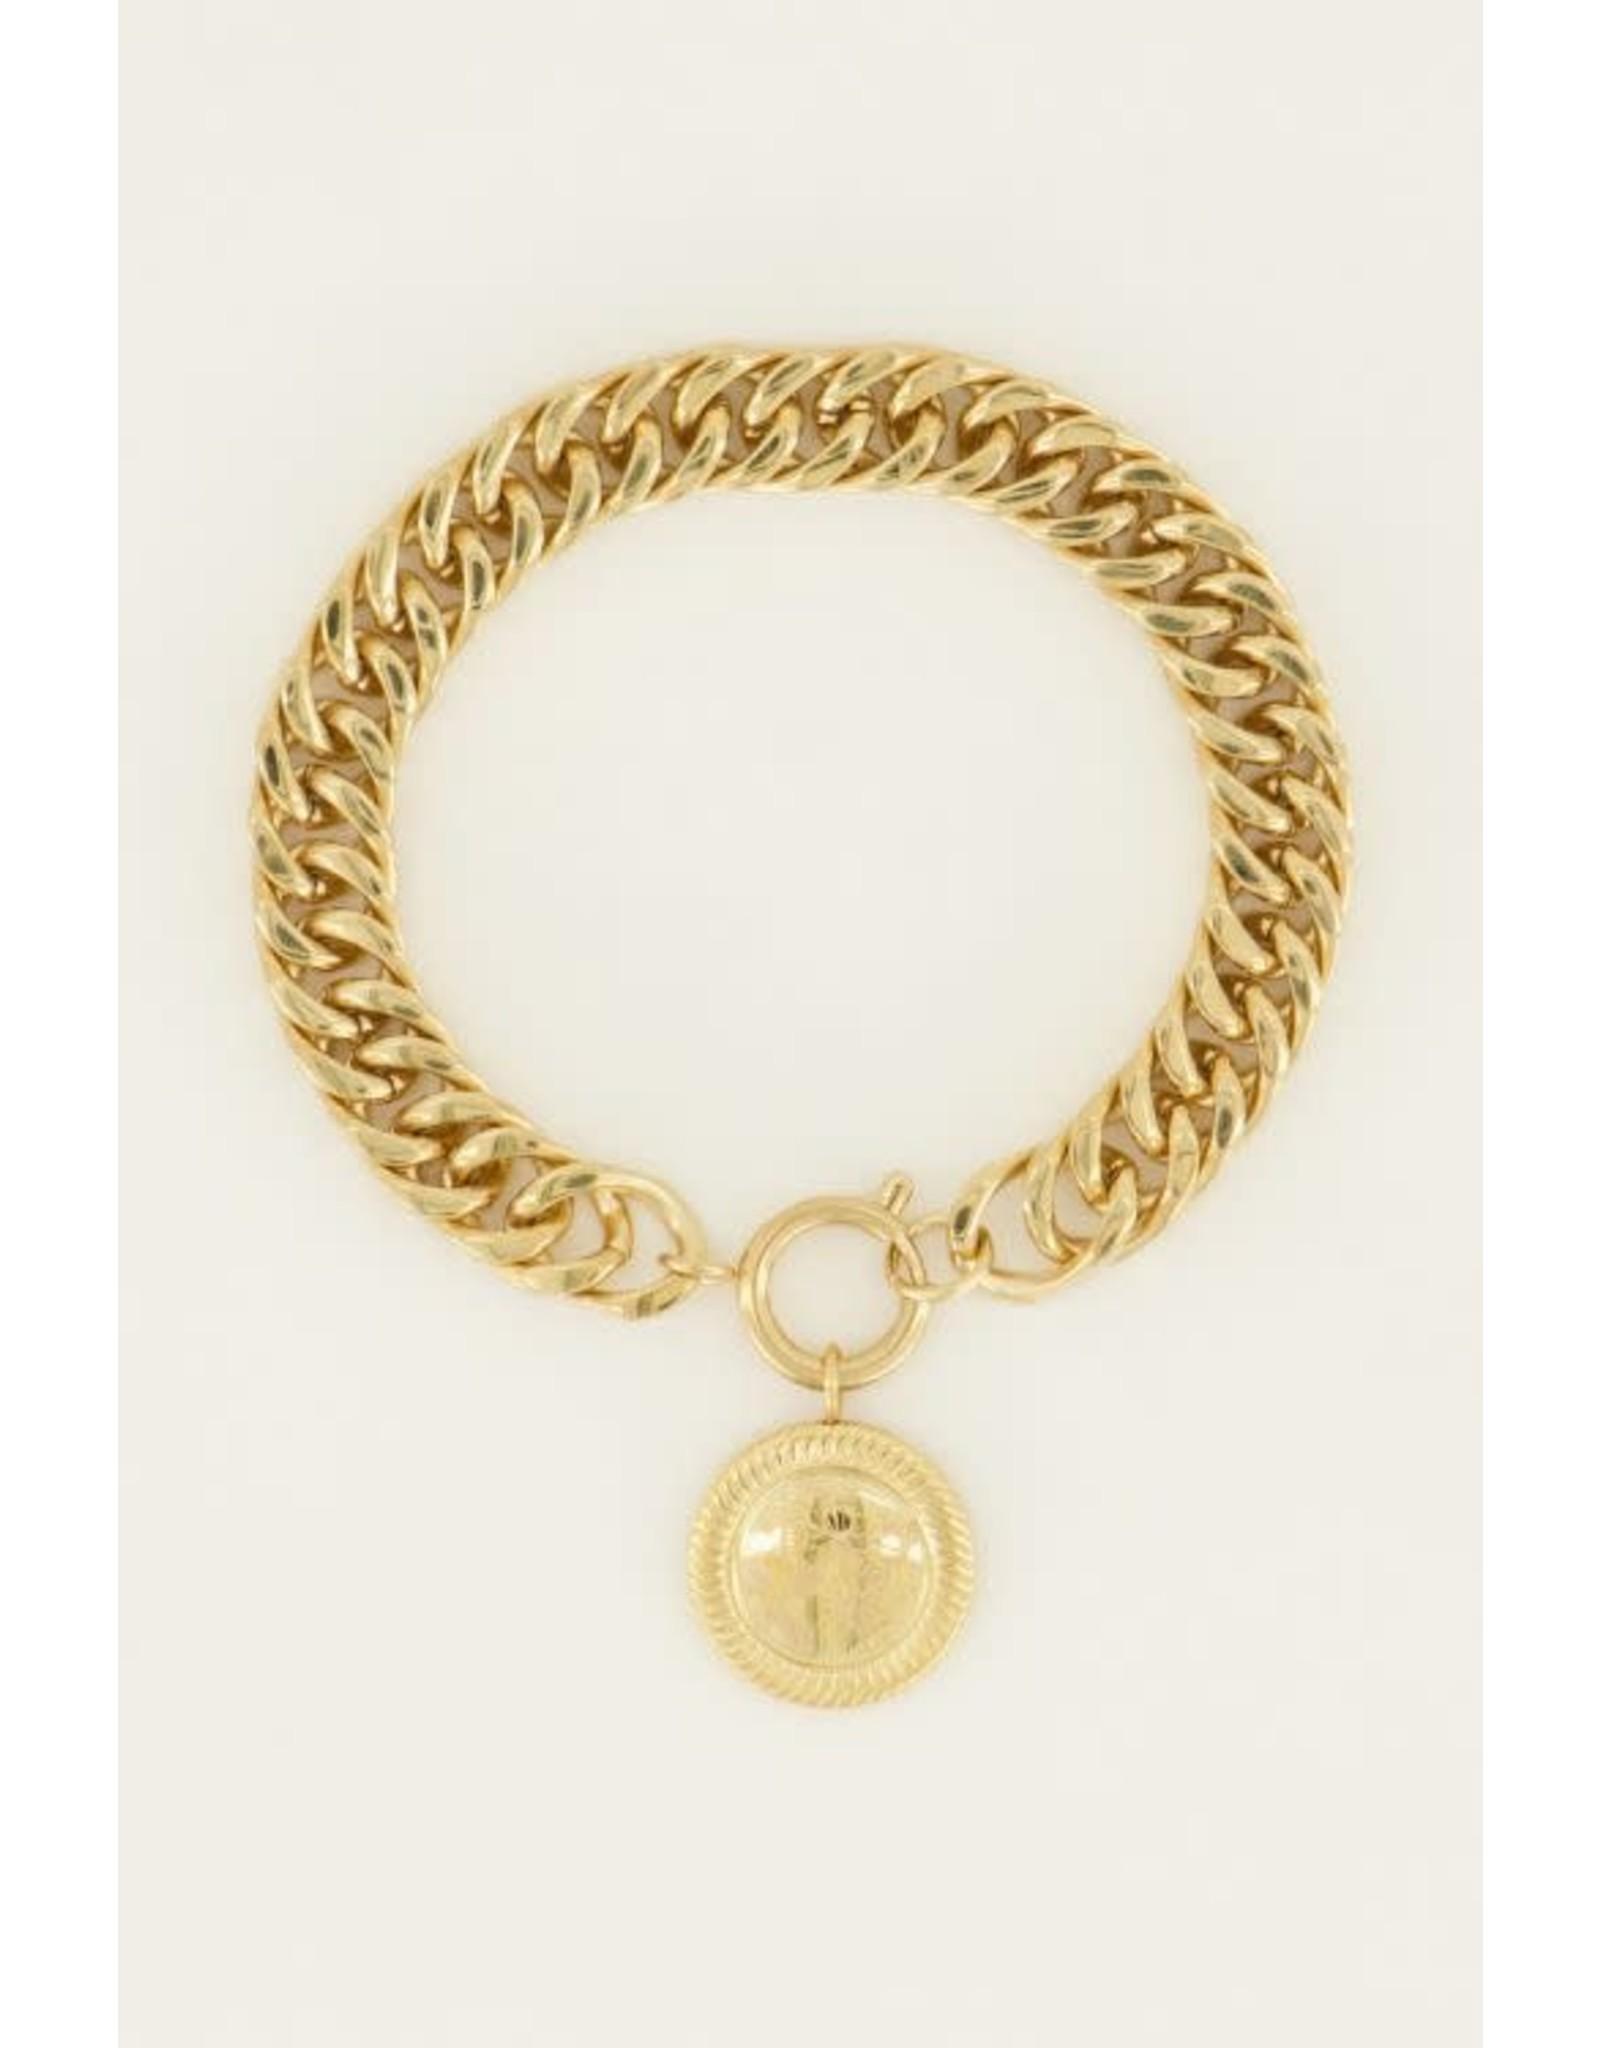 My Jewellery My Jewellery schakelarmbanden munt